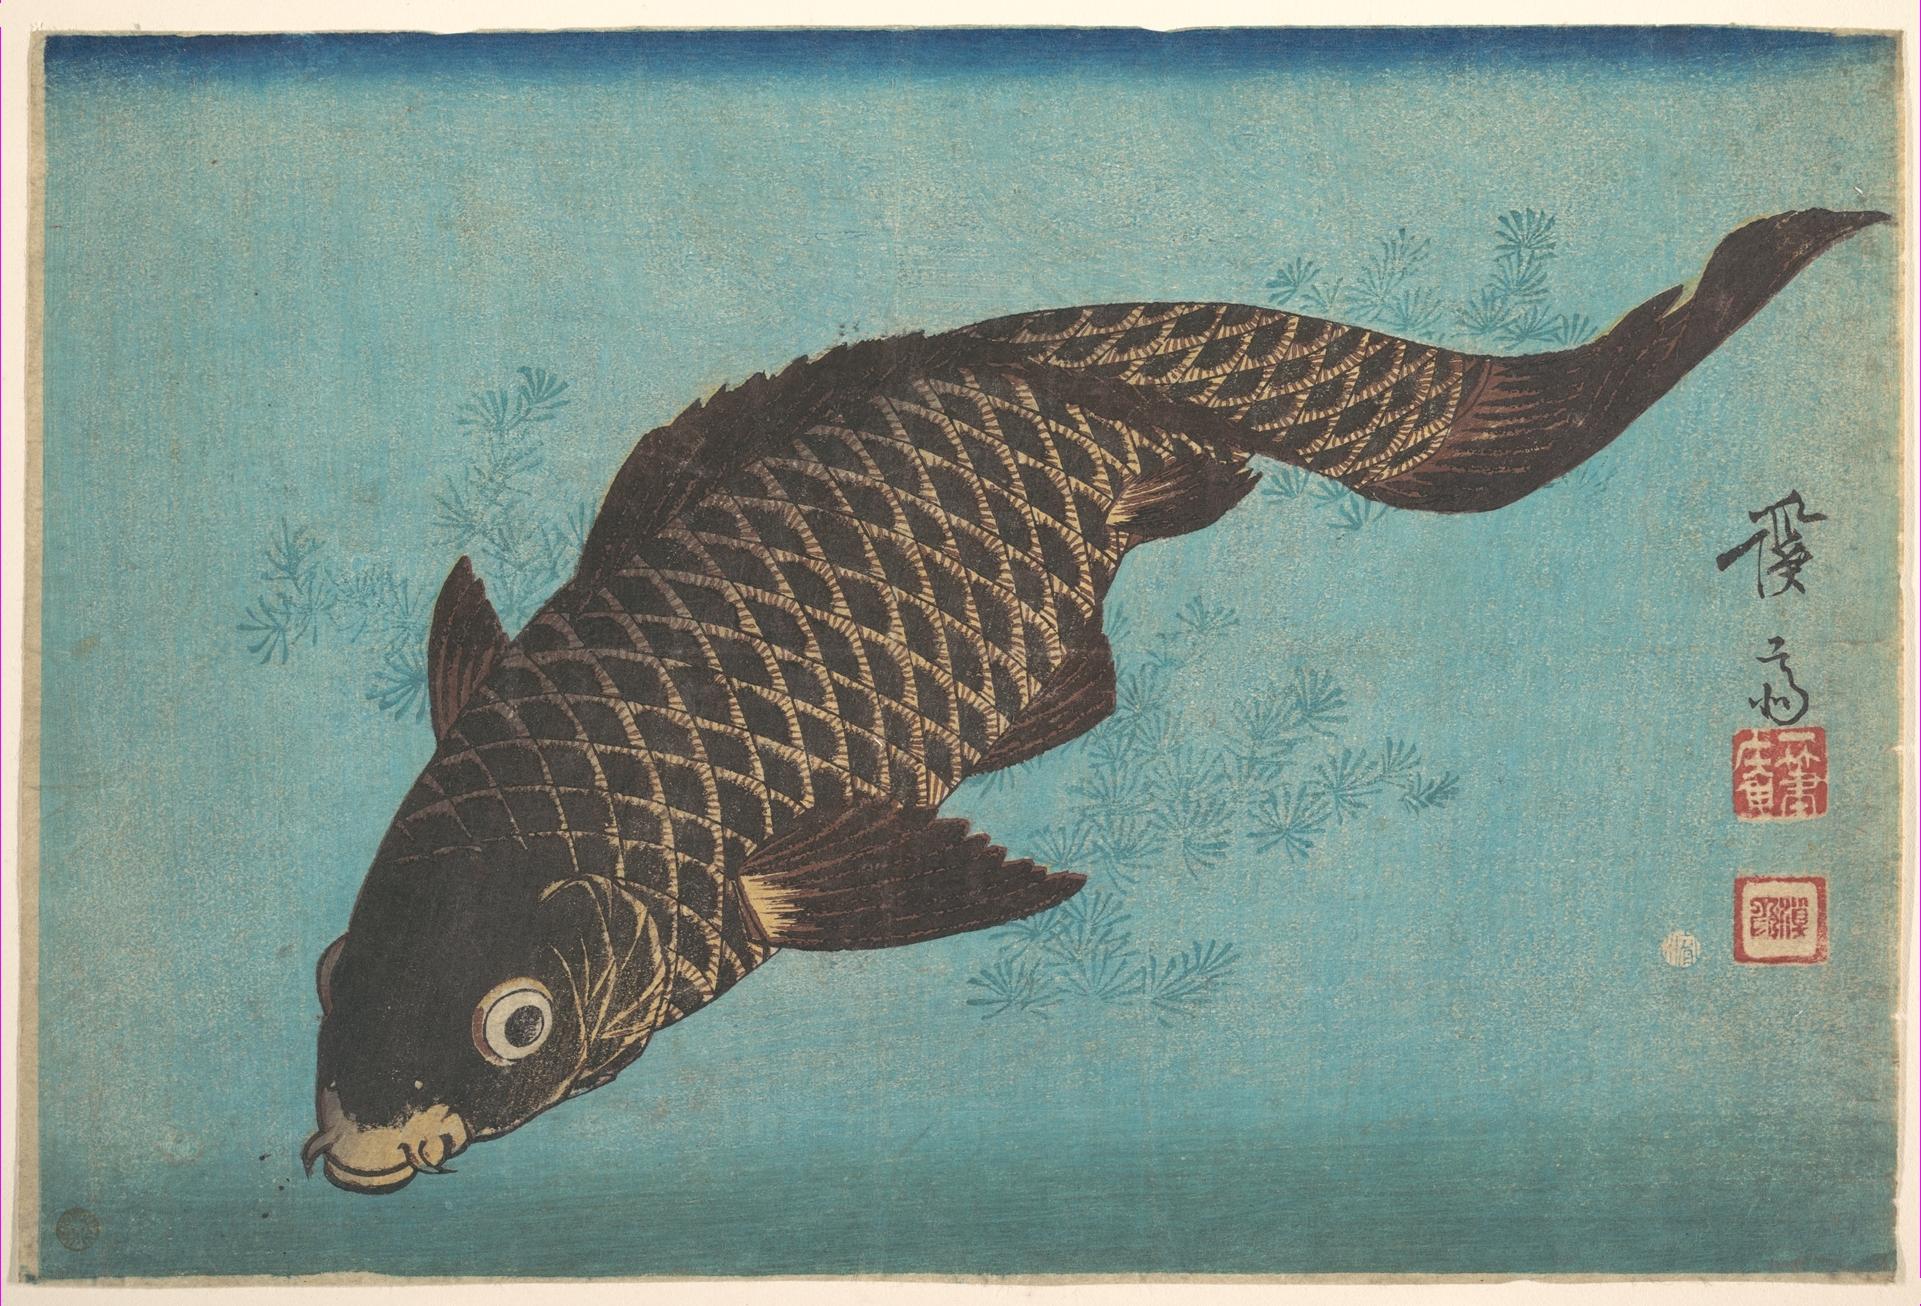 Keisai eisen koi metropolitan museum of art ukiyo e for Koi fish culture